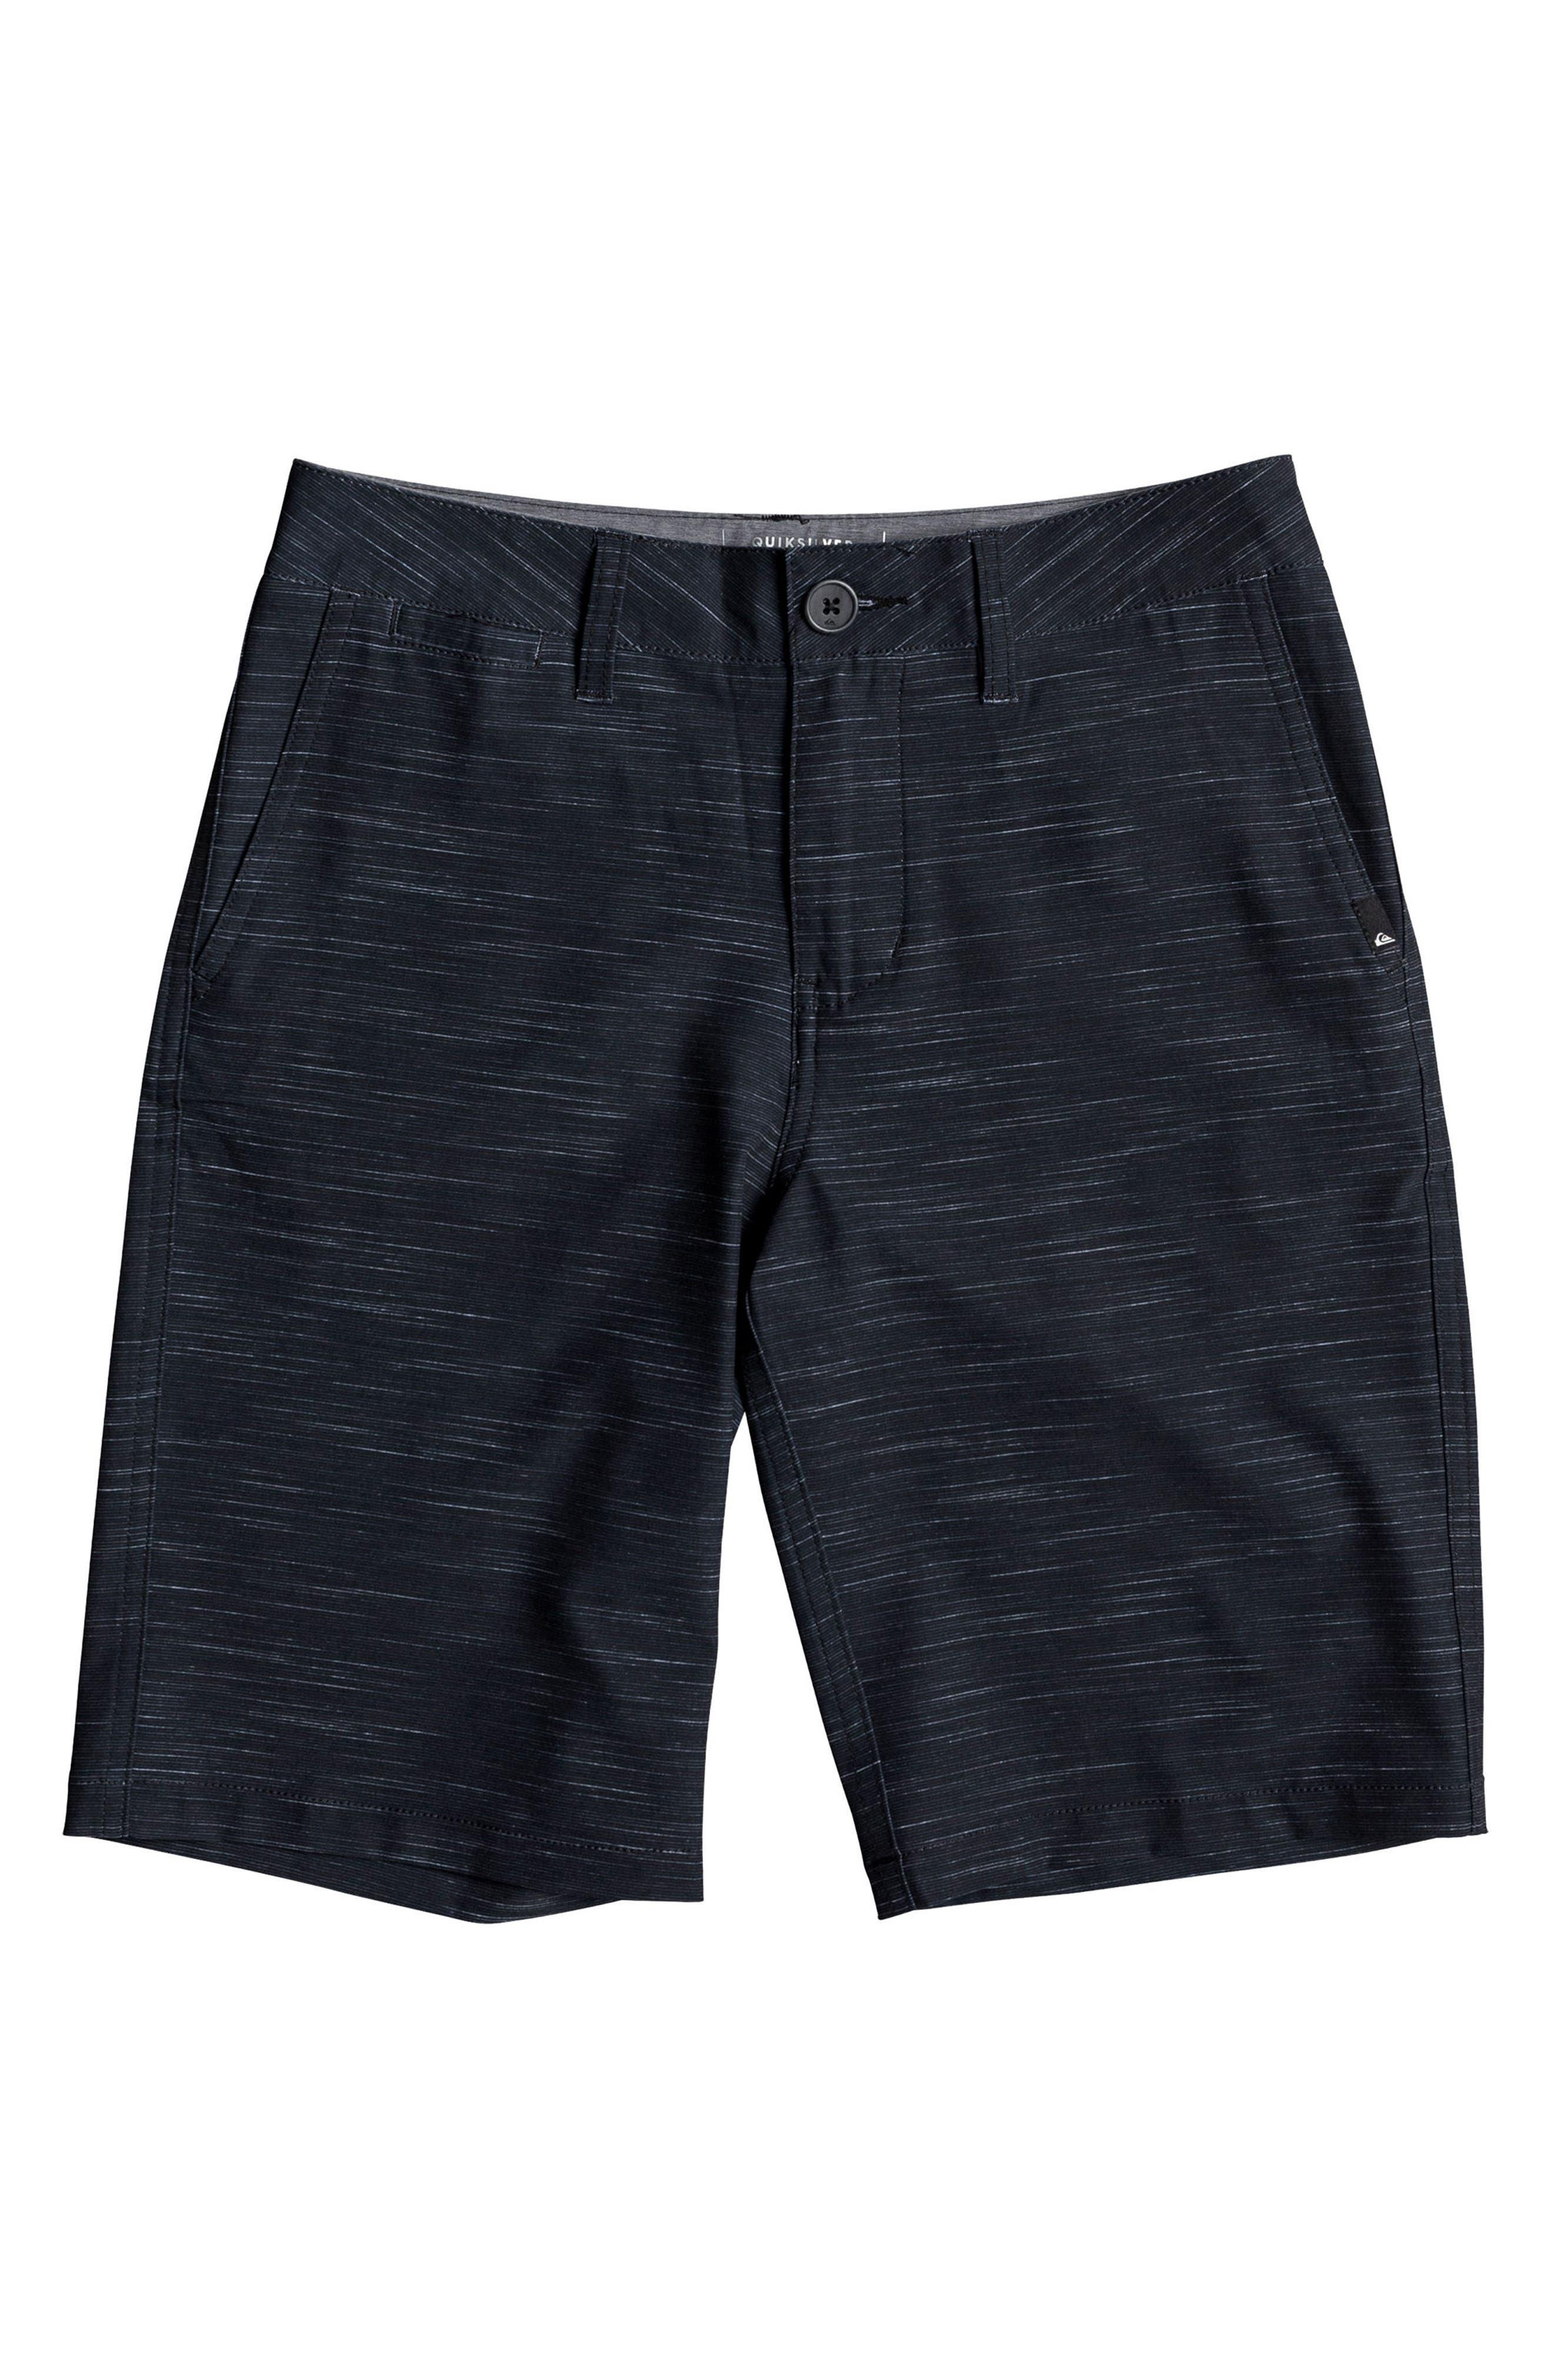 Union Slub Amphibian Board Shorts,                         Main,                         color,